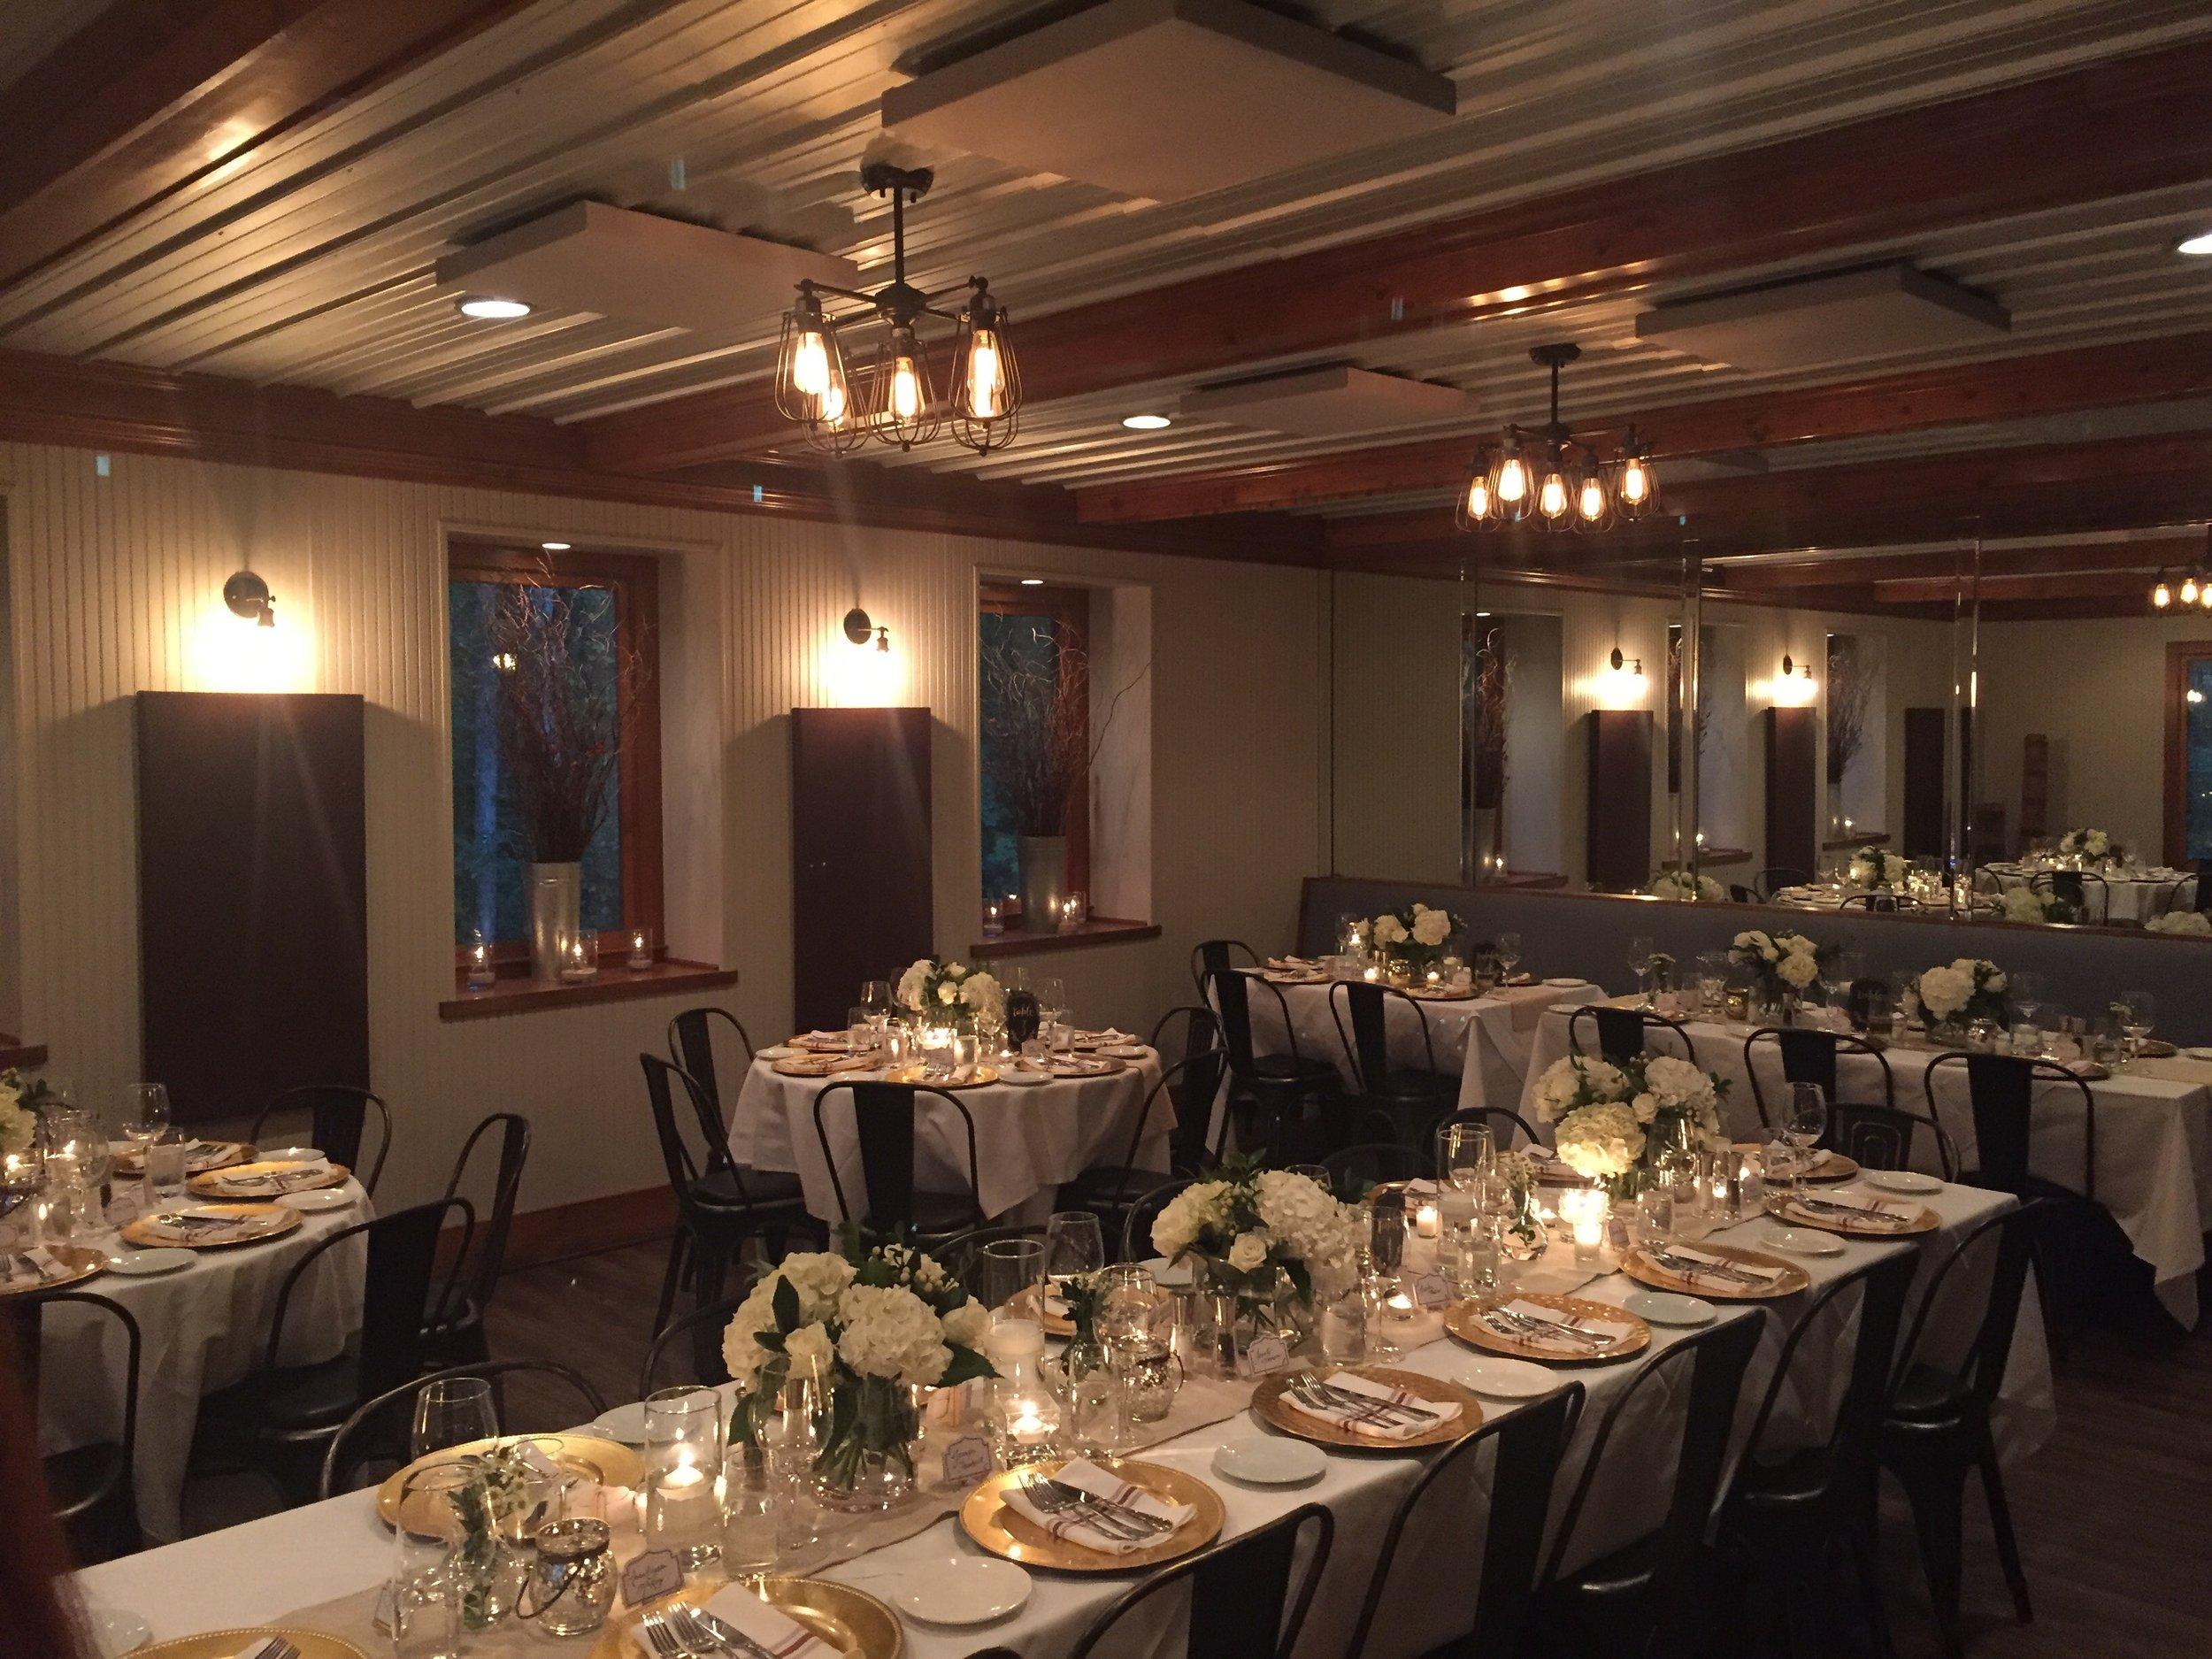 home-resturant-banquet-room.JPG